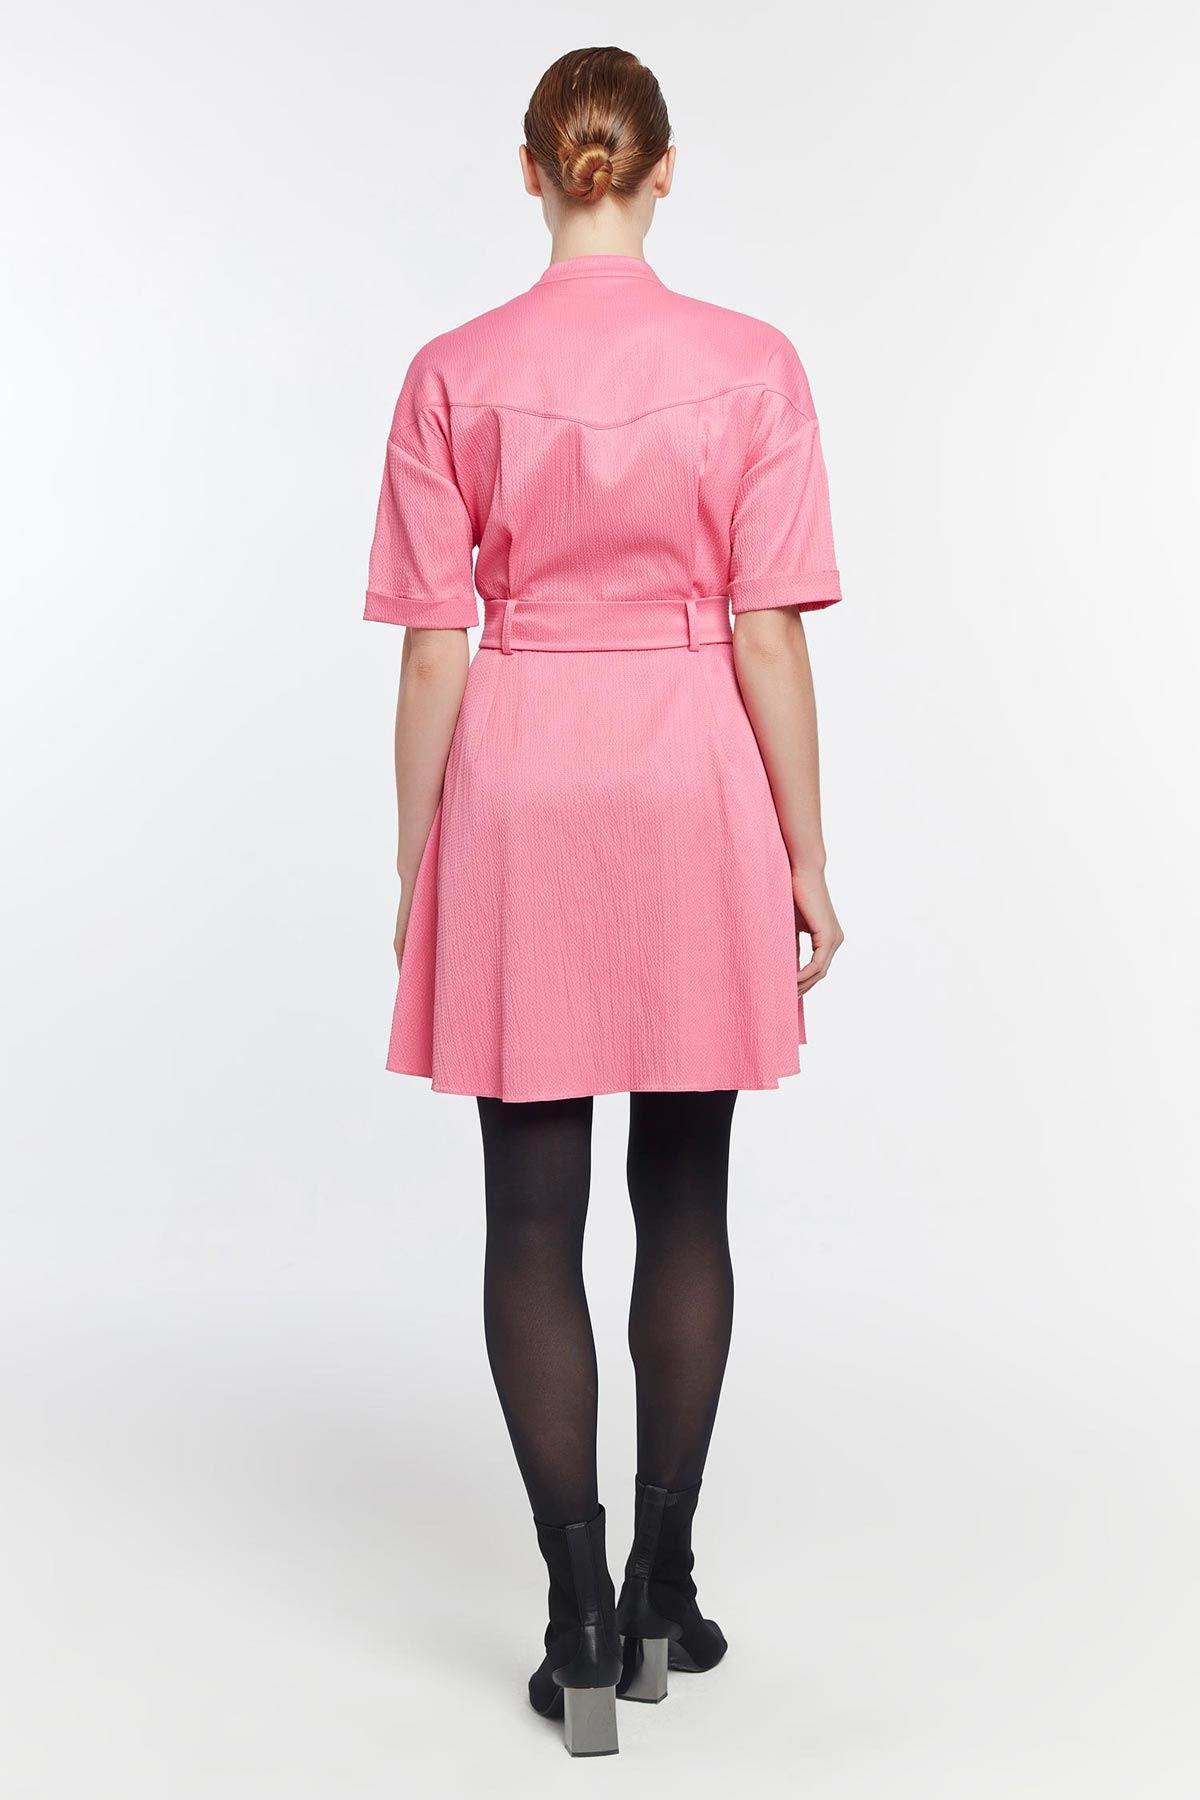 Düğme kapama kemerli elbise Pembe